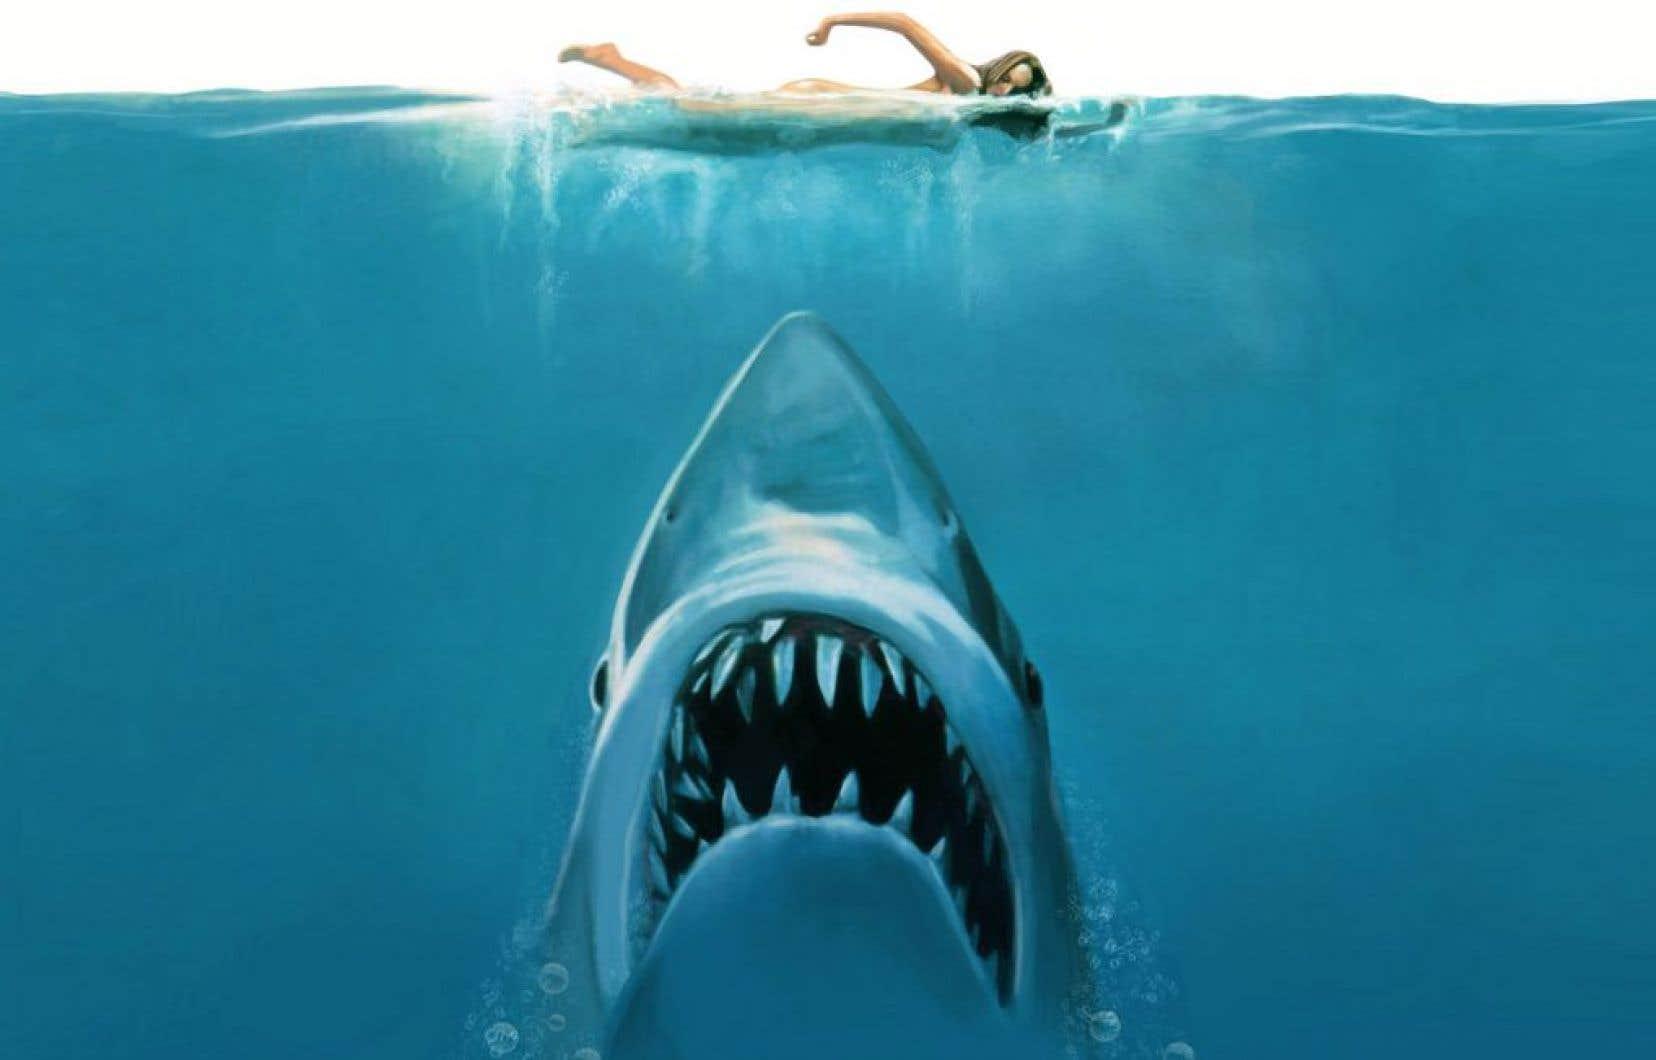 En 1975, Spielberg transforme radicalement l'image du squale dans Jaws.